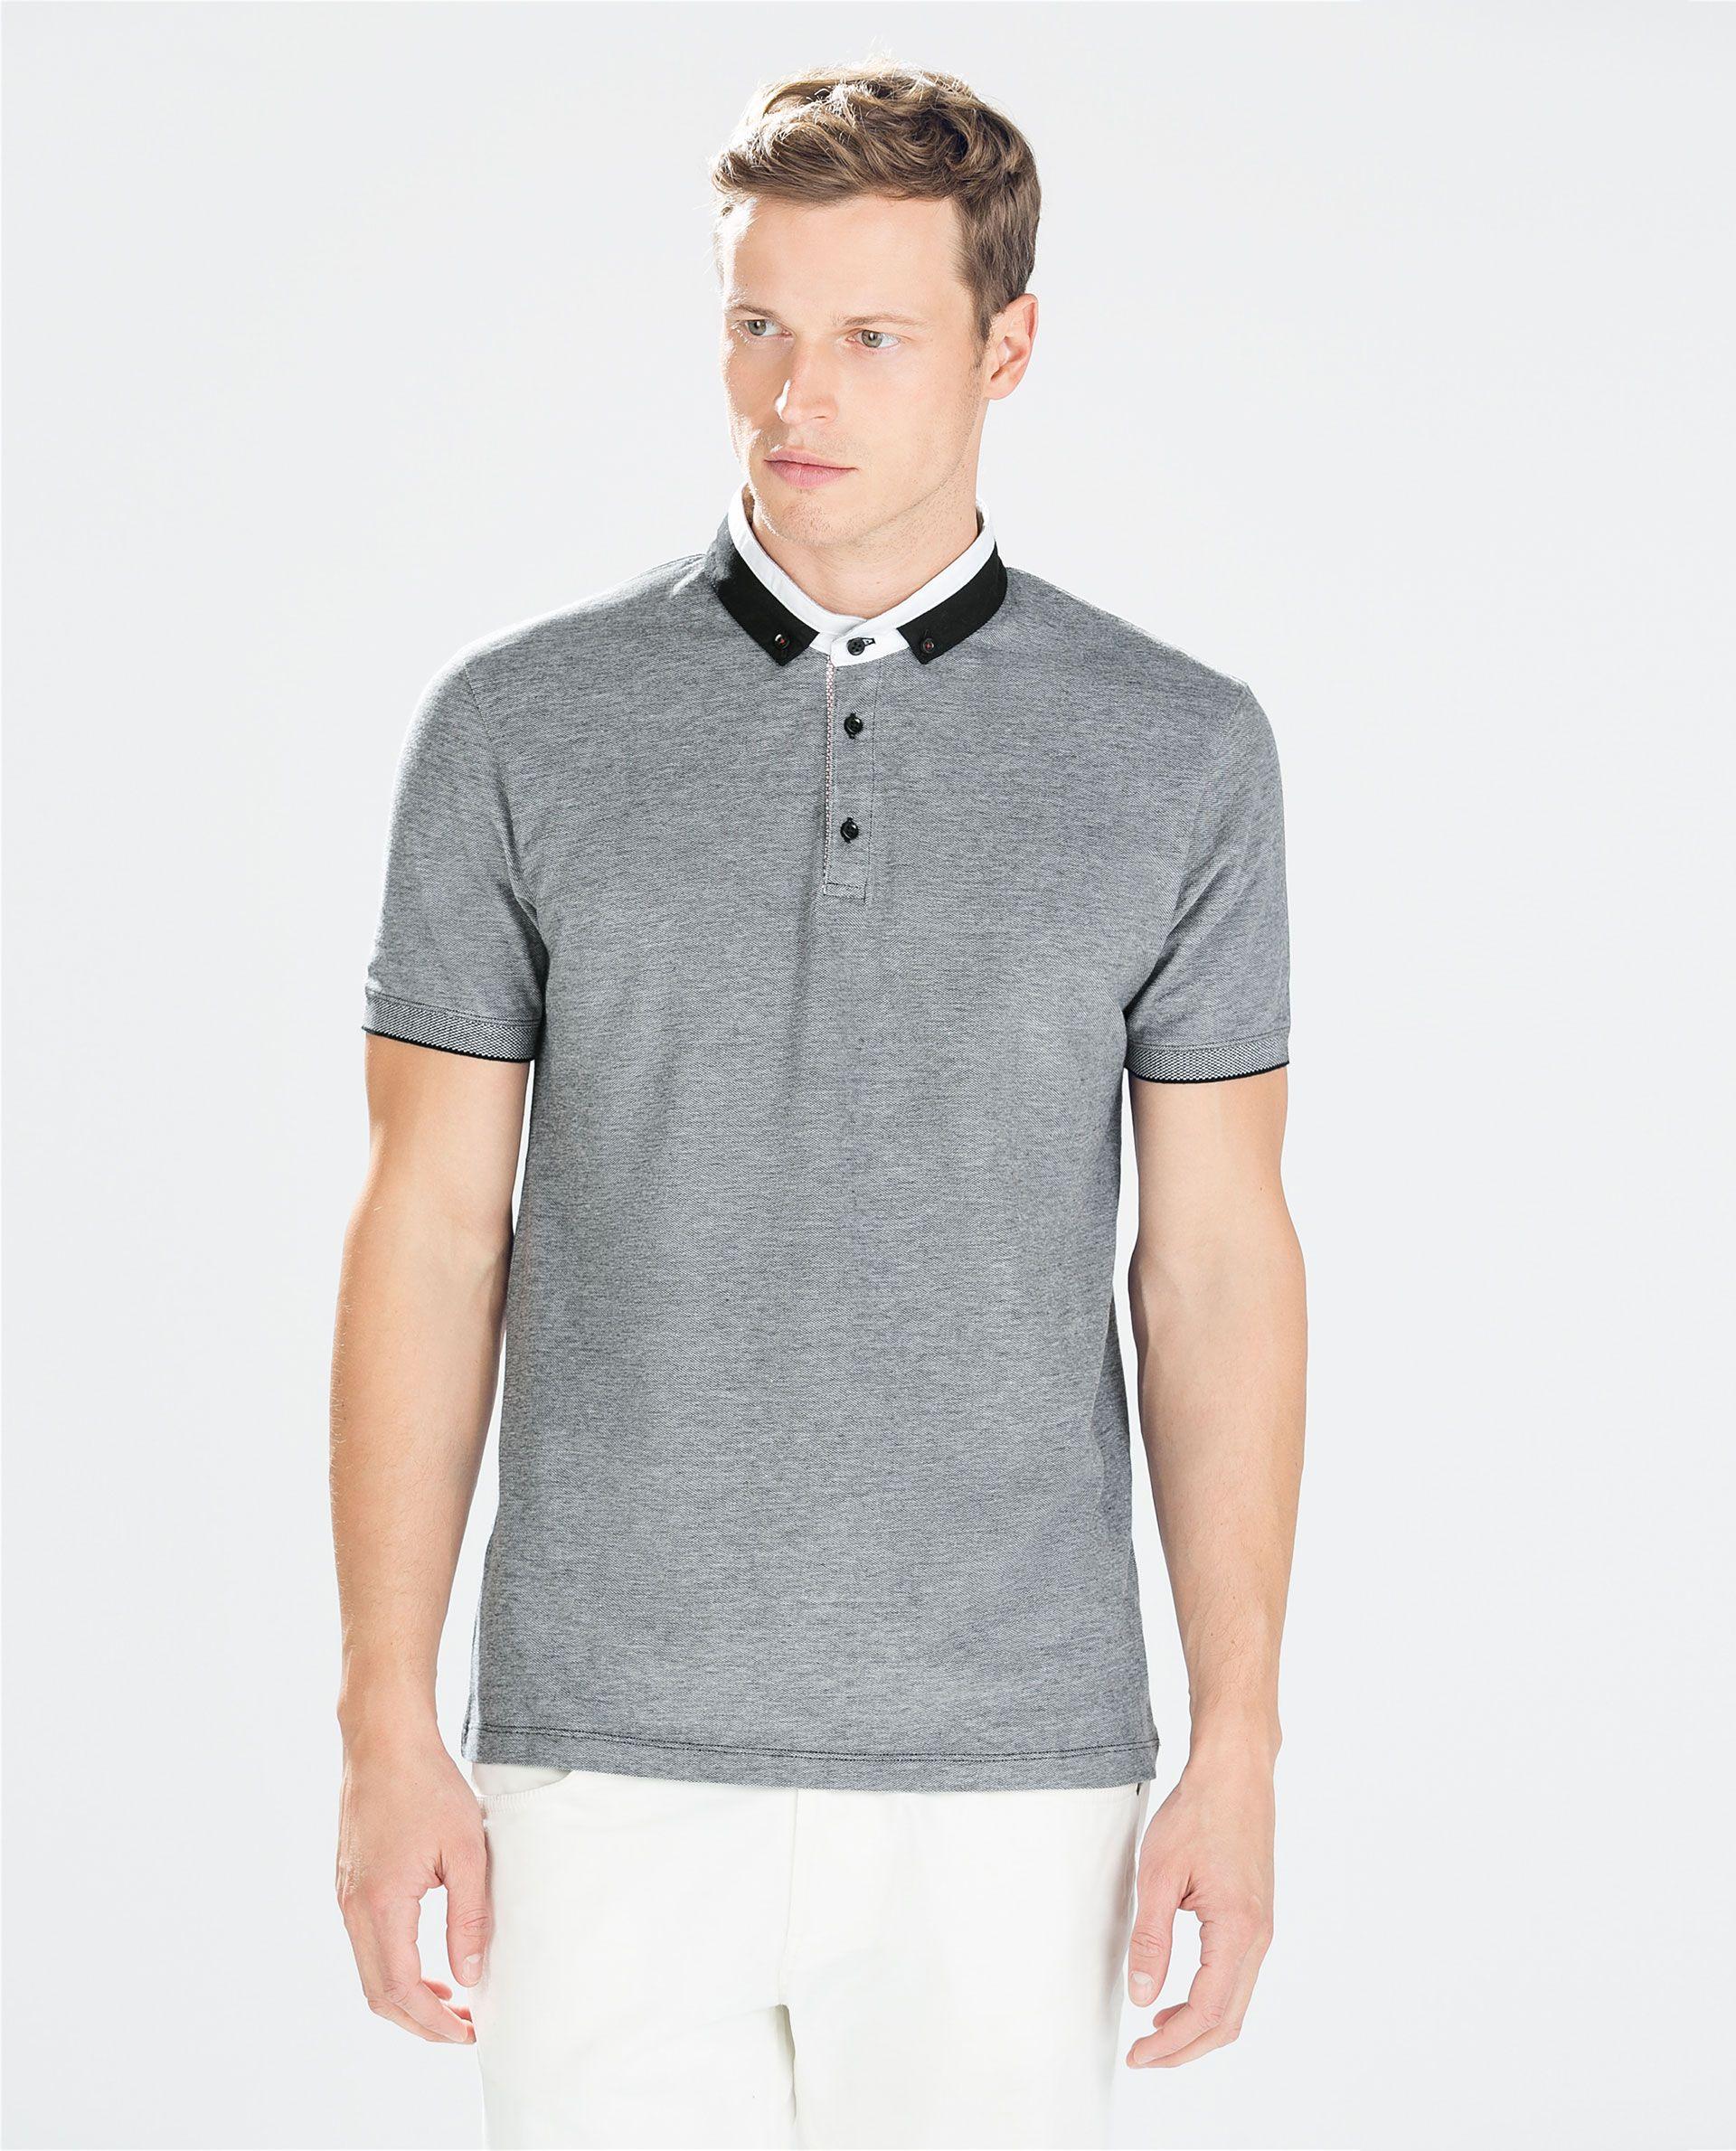 be7a597d7 SHORT SLEEVE POLO SHIRT - Polo shirts - T - shirts - MAN | ZARA Turkey